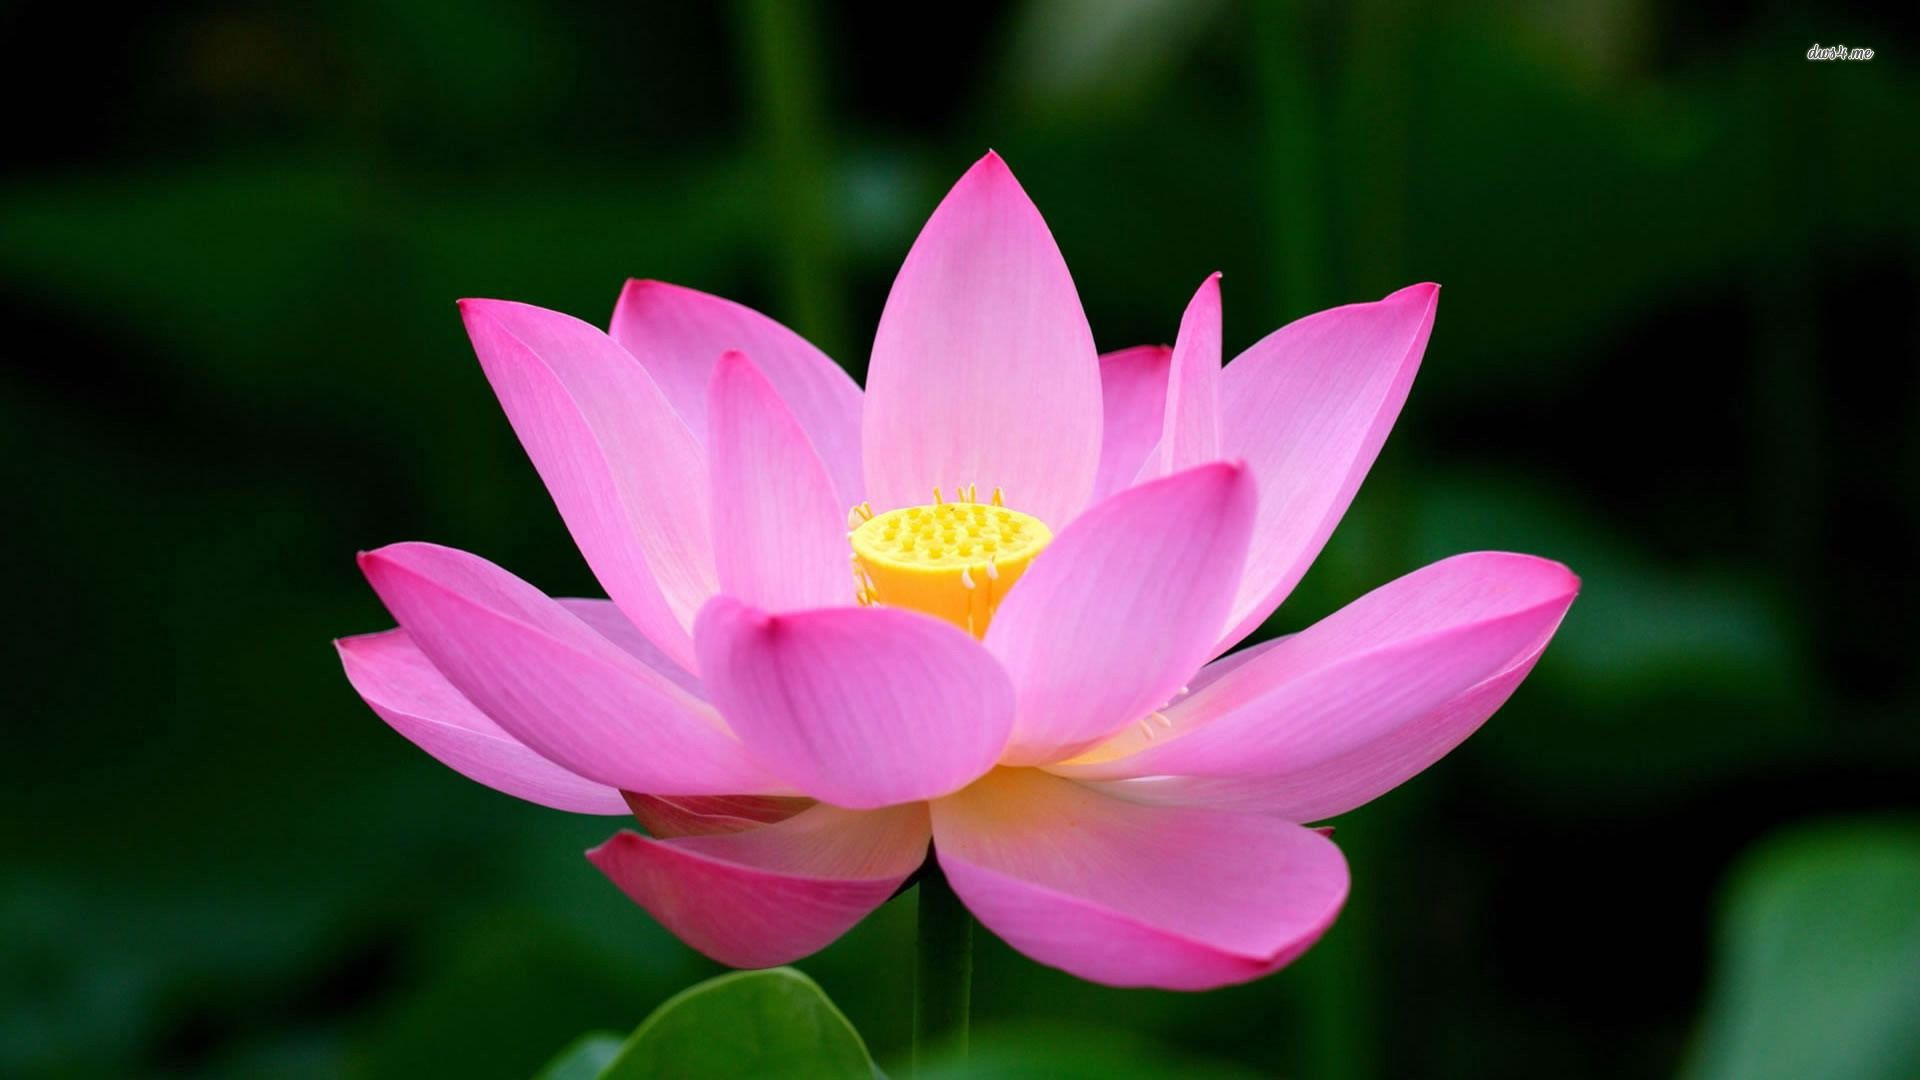 Lotus Flower Wallpaper3 Flower Wallpaper Lotus Pinterest